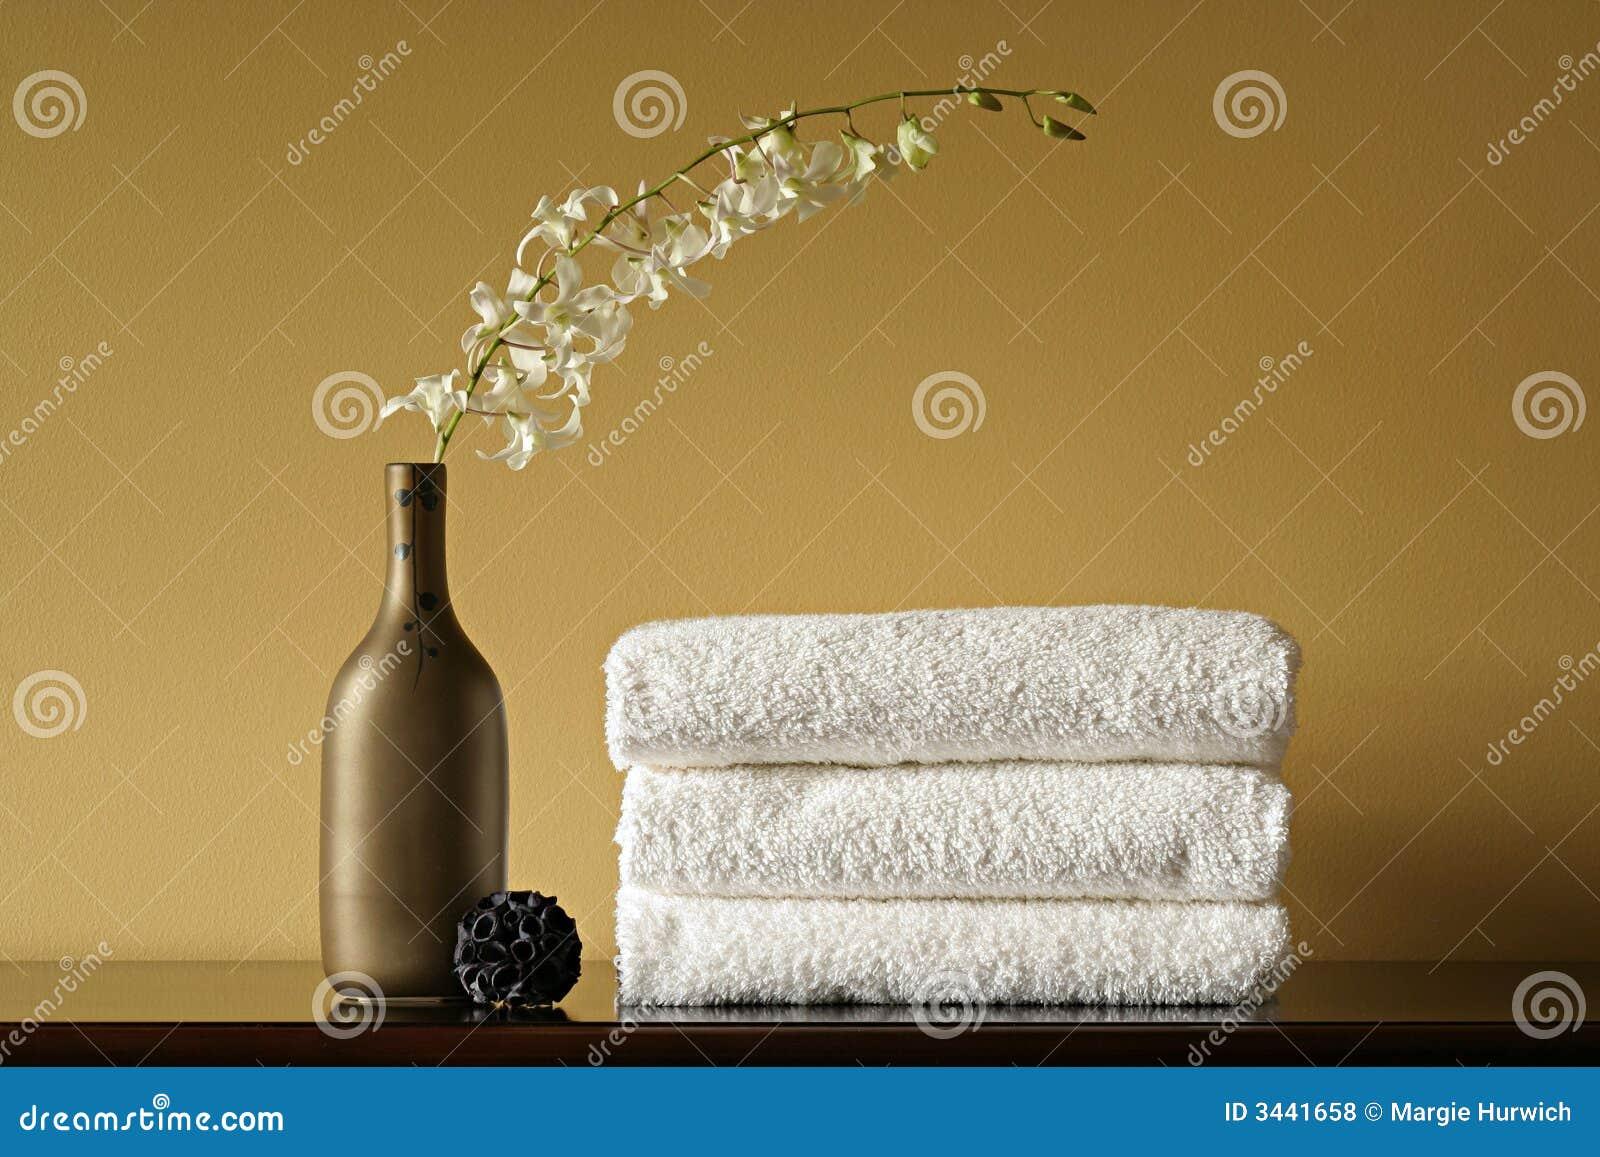 white vase towel 2560x1440 -#main